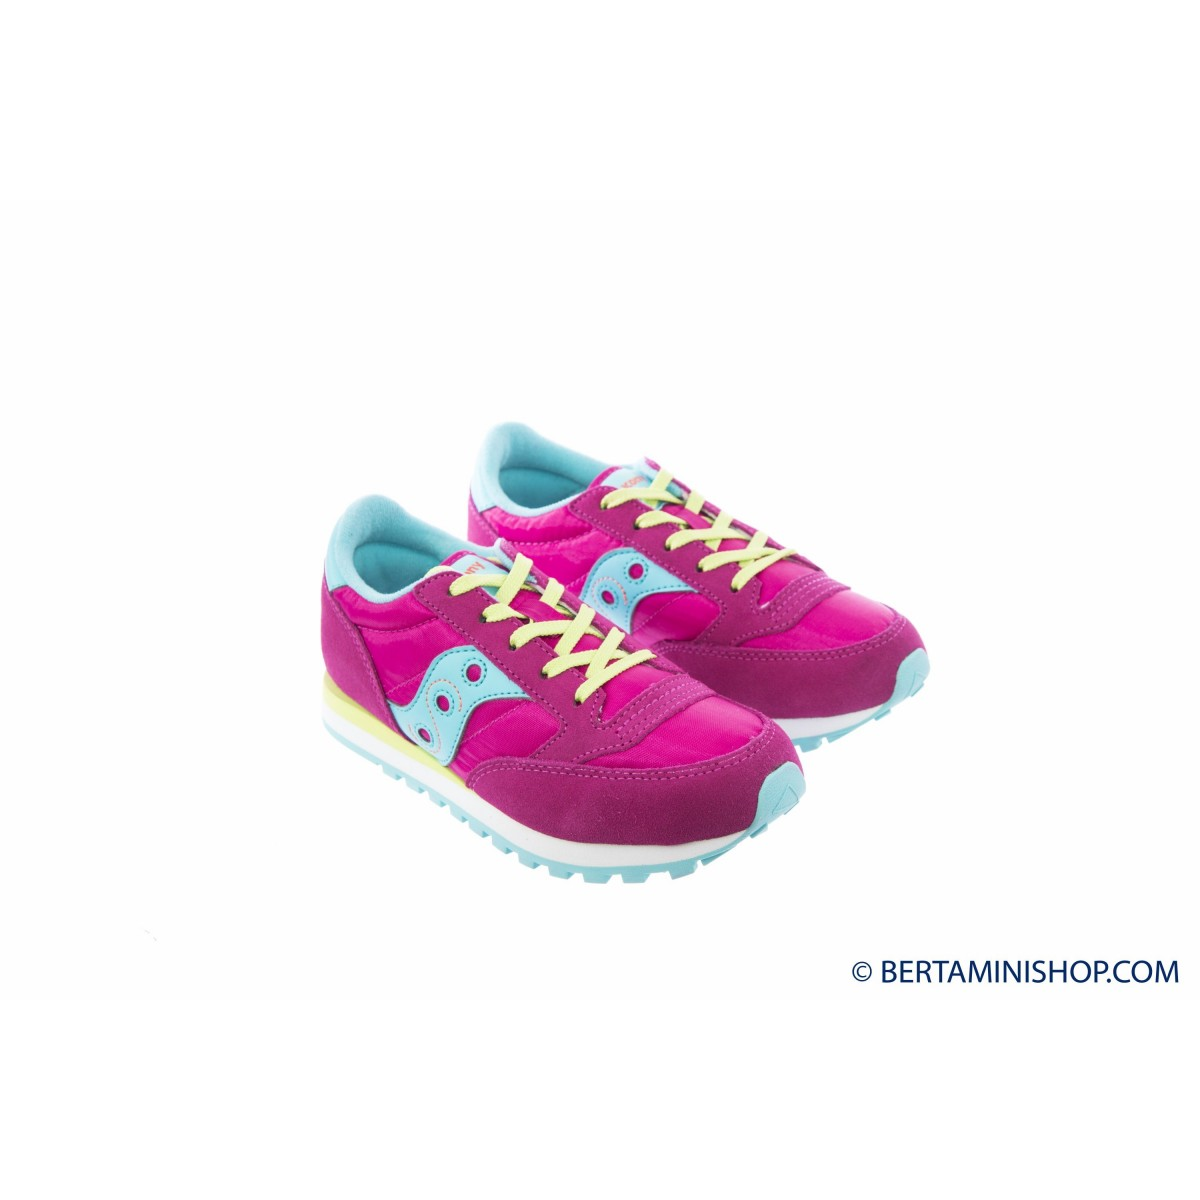 Shoes Saucony Girl's - SC55999 Kid'S